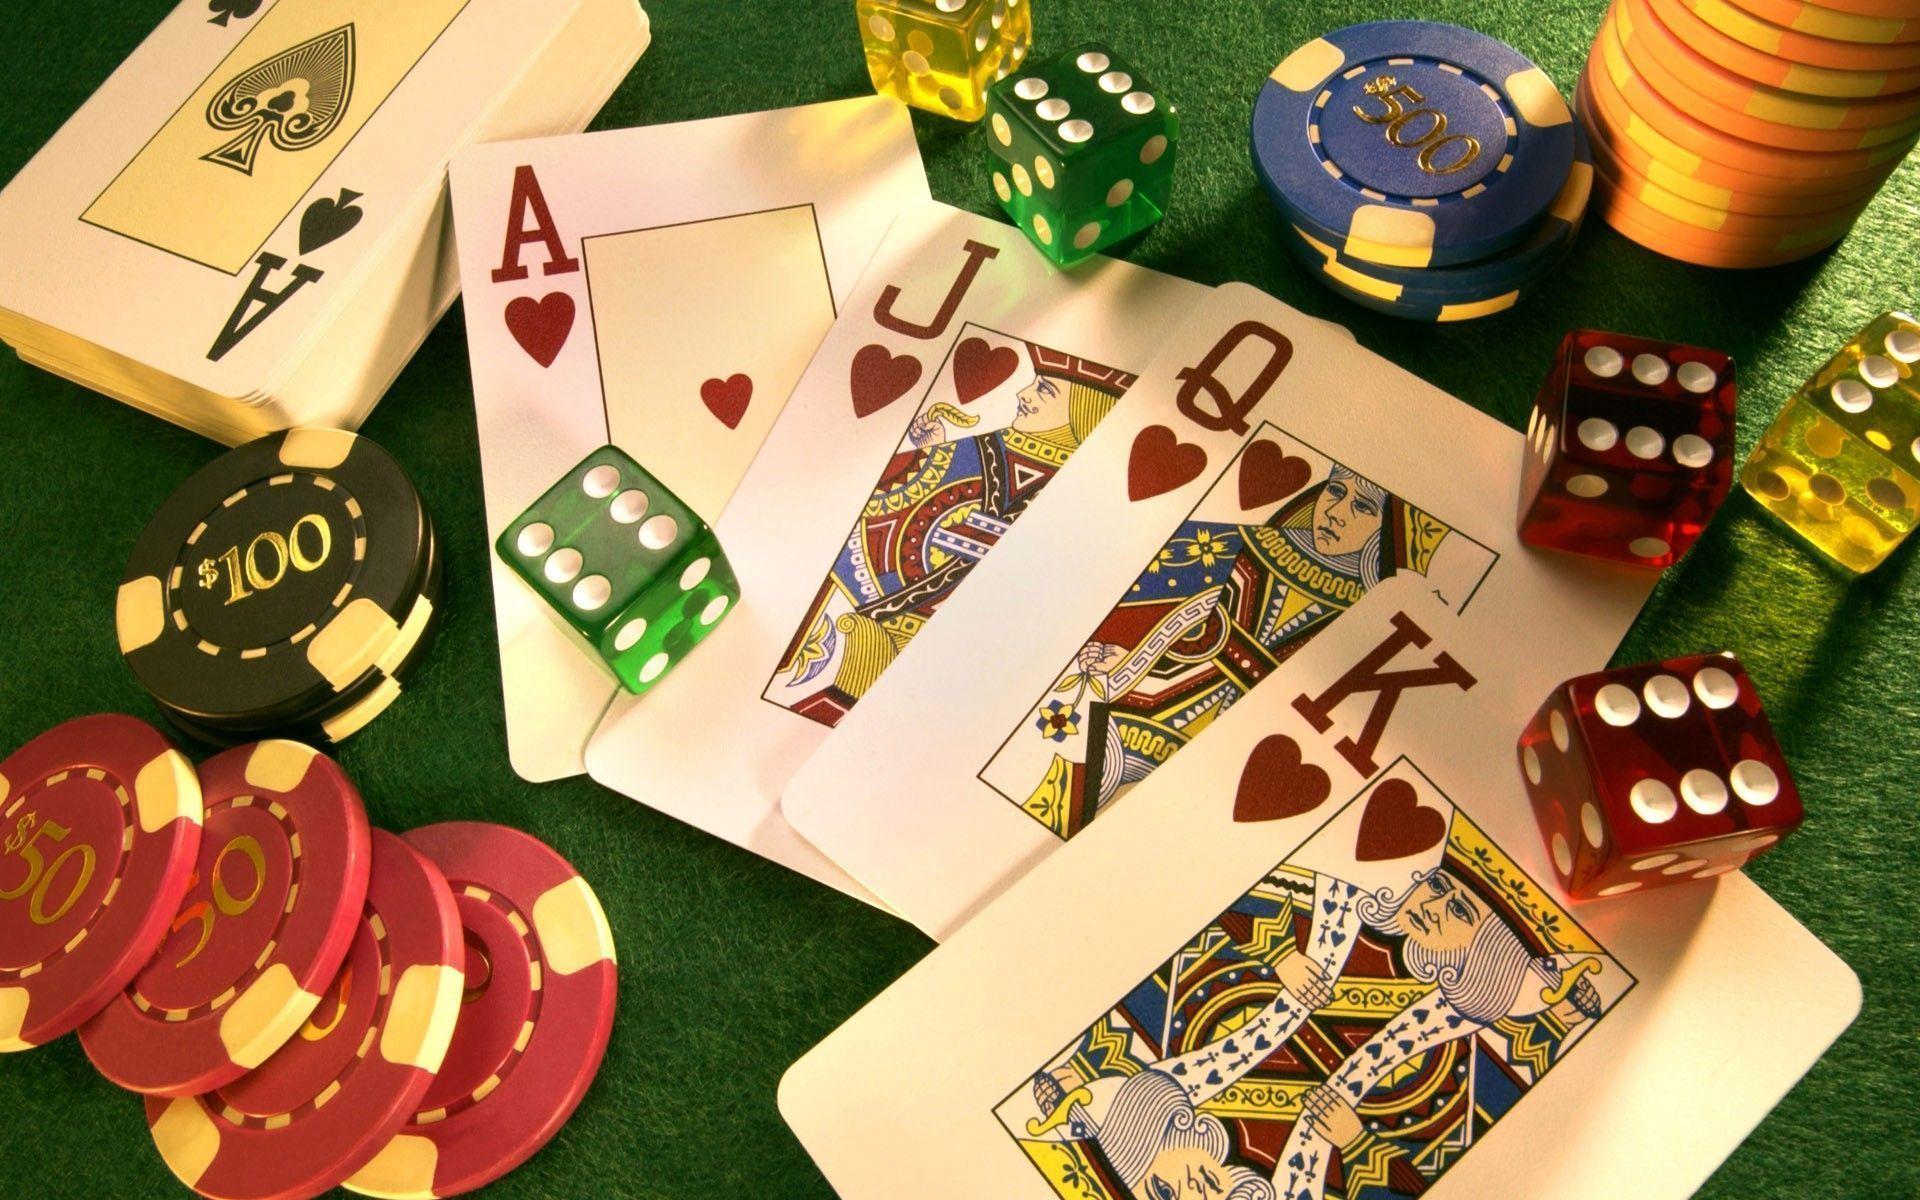 online casino no deposit bonus codes 2019 usa